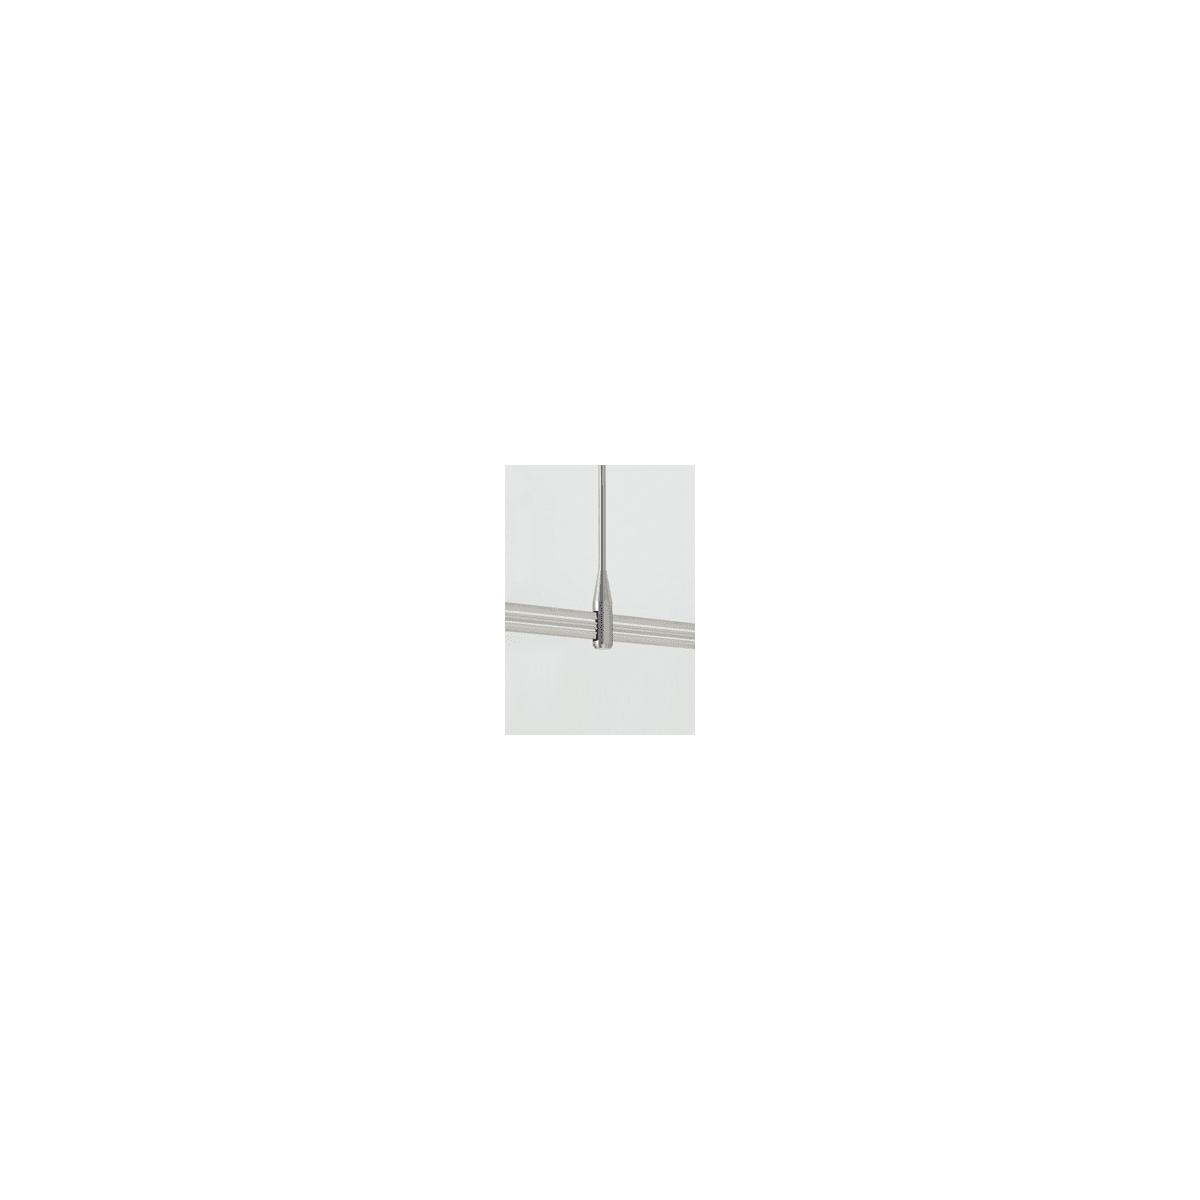 Satin Nickel Tech Lighting Two-Circuit MonoRail Rigid Standoff 700MO2S02S